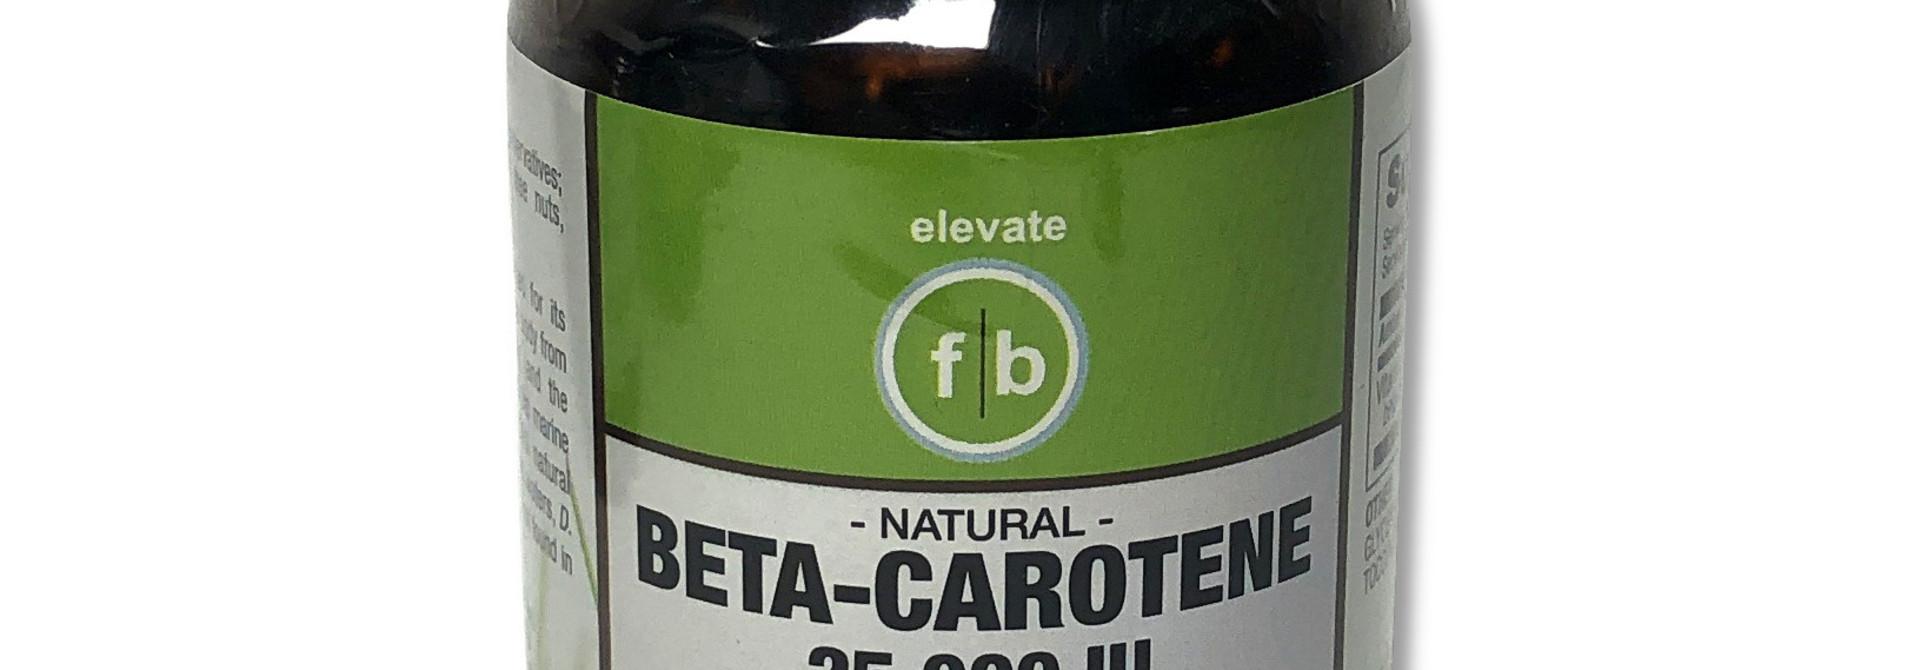 Beta-Carotene 25,000 IU